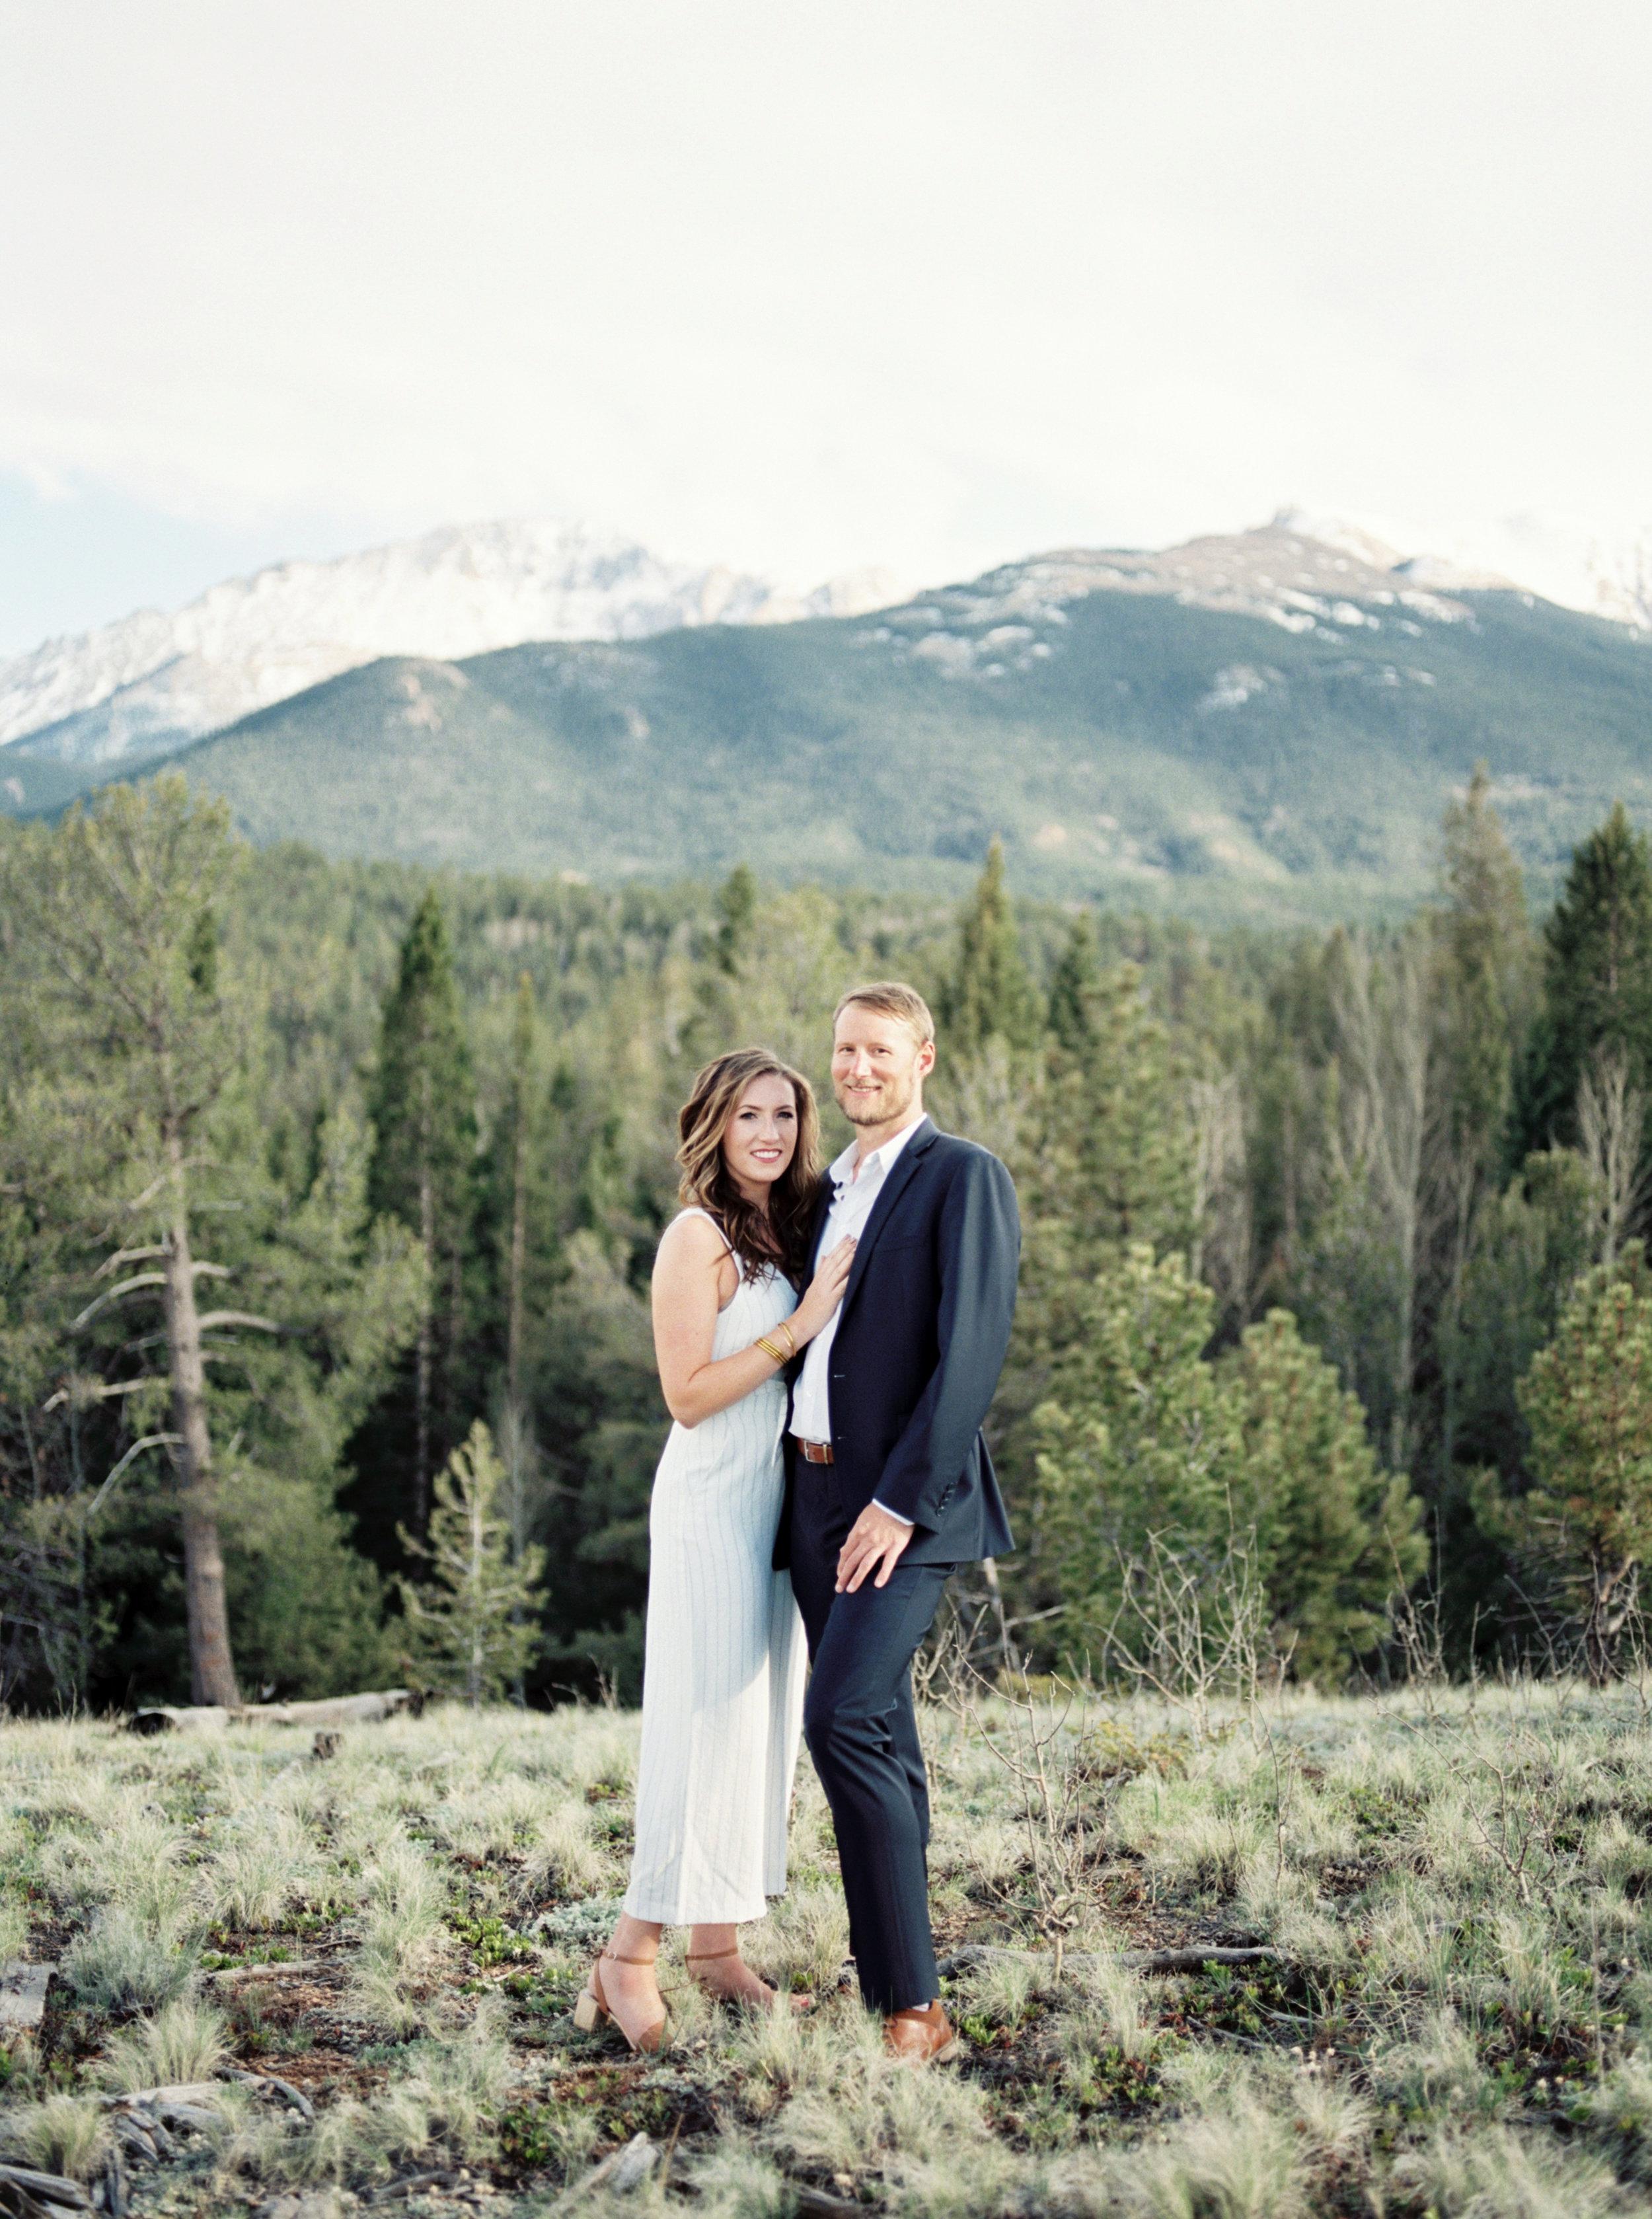 Tara Bielecki Photography - Pikes Peak, Colorado Springs Summer Engagement Session